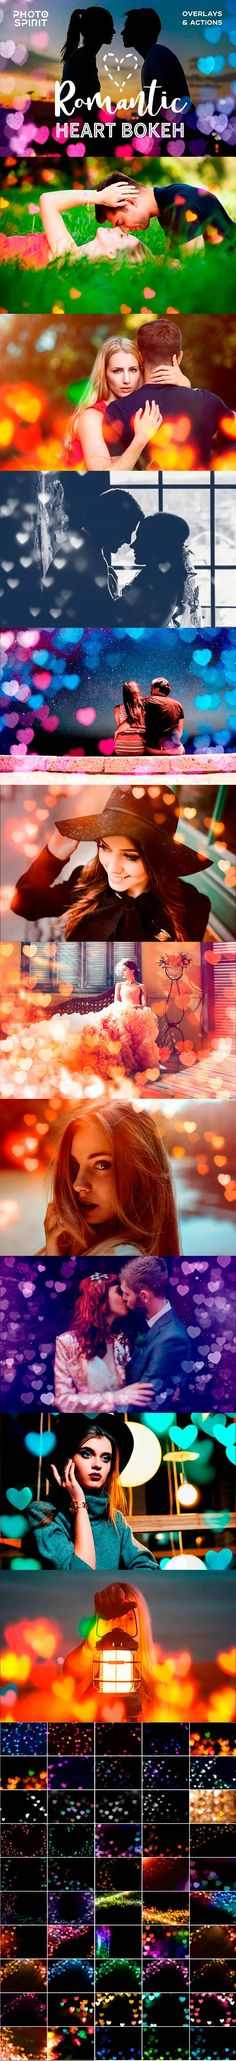 Romantic Heart Bokeh Photo Overlays by PhotoSpirit on @creativemarket